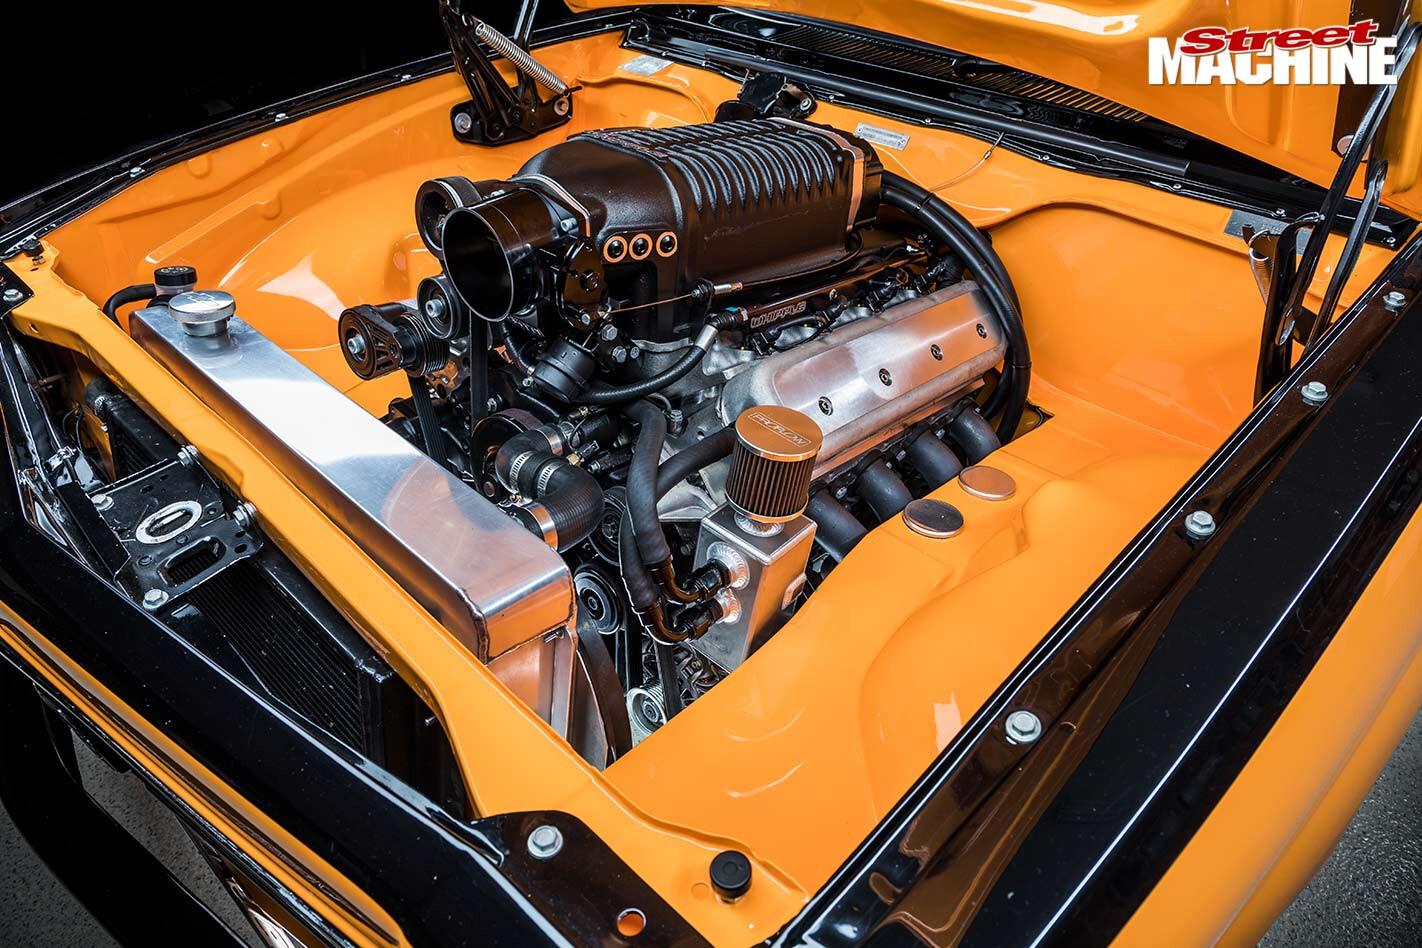 Holden LX Torana engine bay